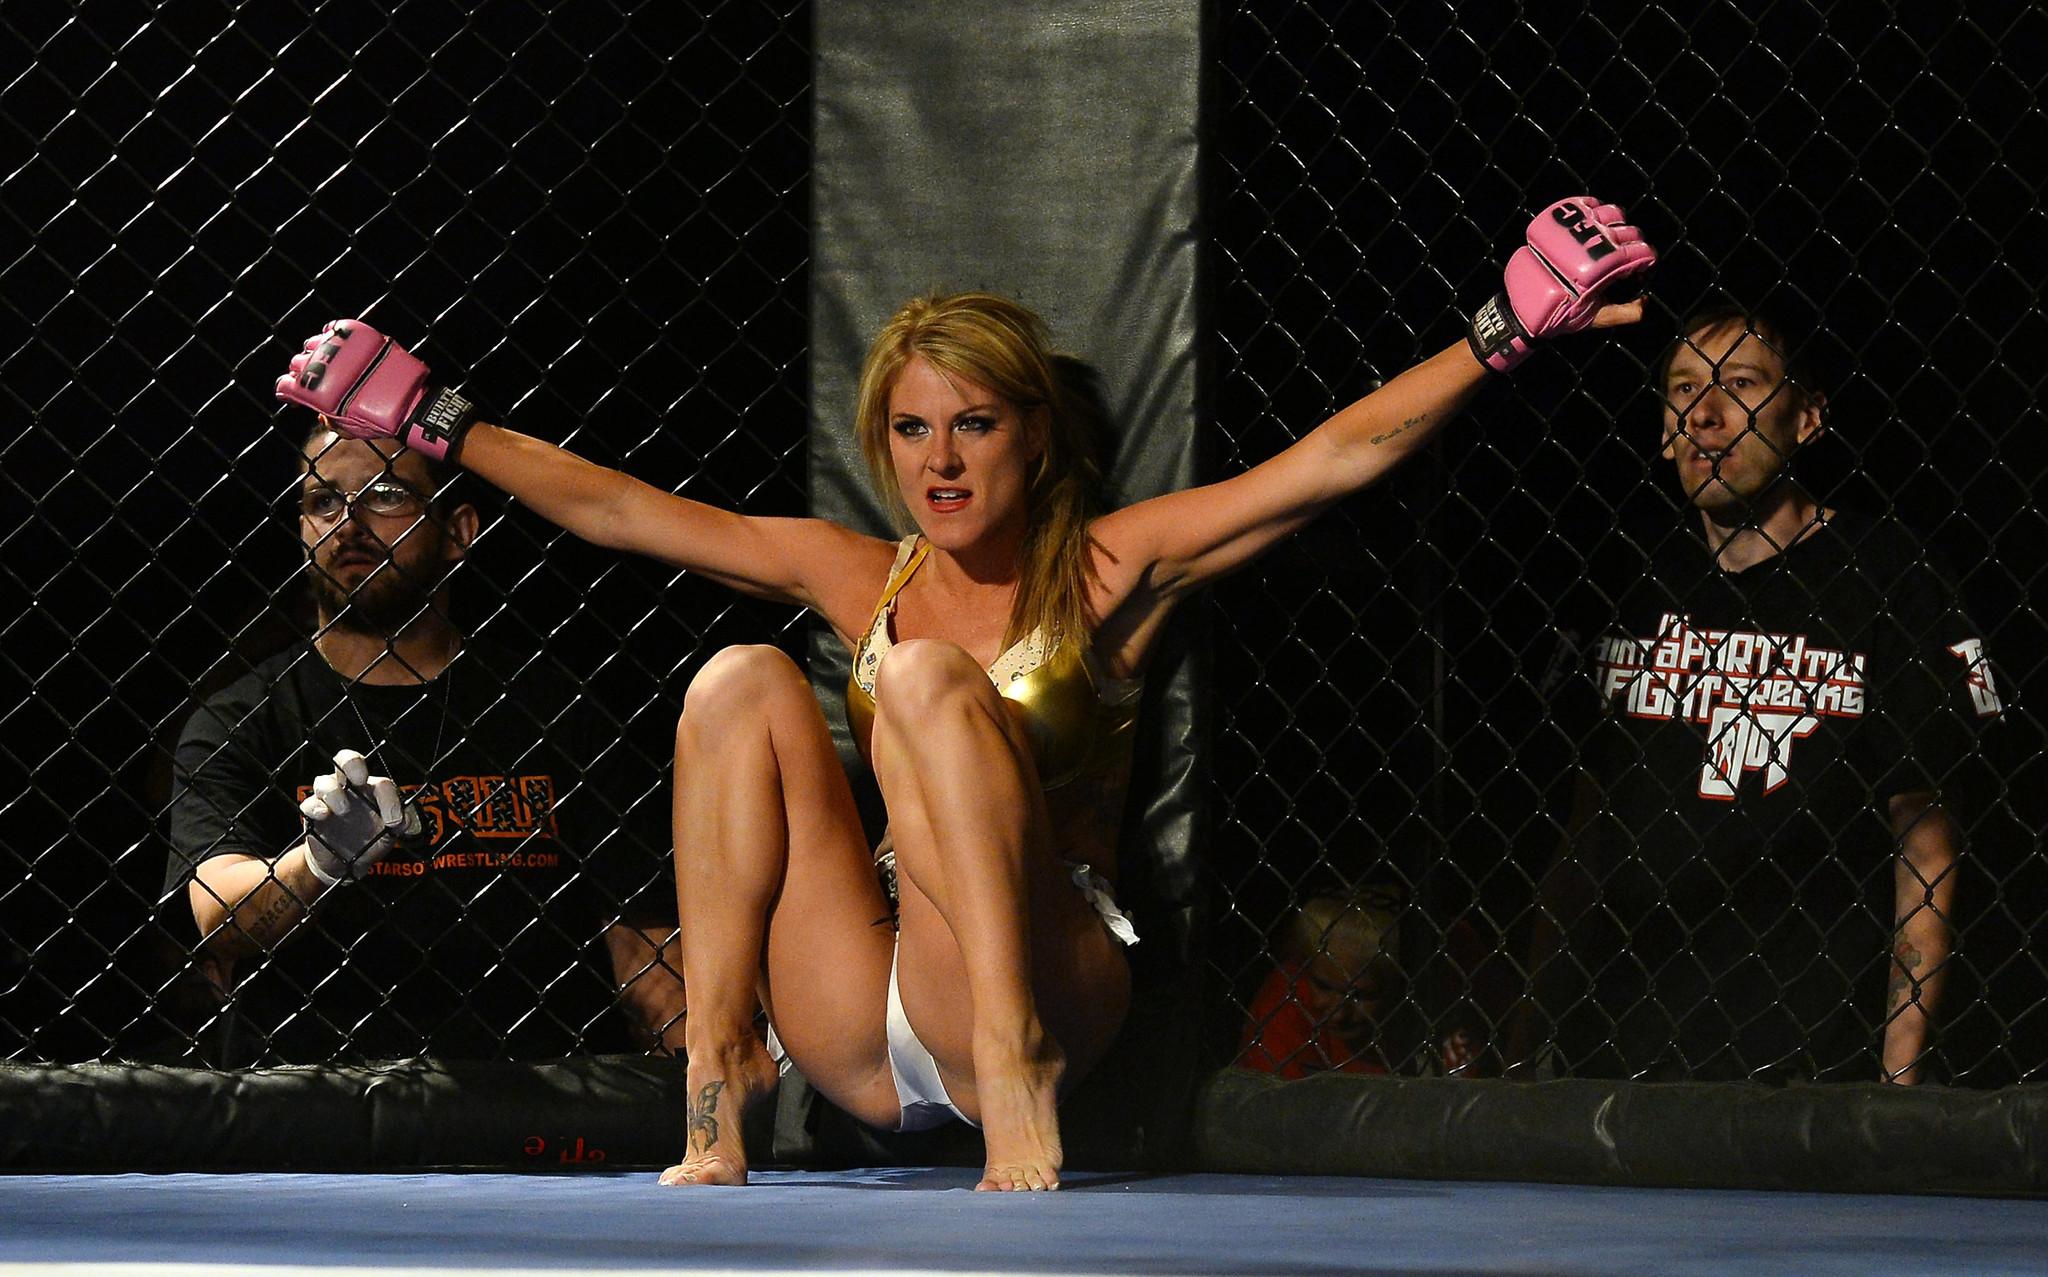 http://www.trbimg.com/img-5390be48/turbine/sfl-lingerie-fighting-championship-20140605-023